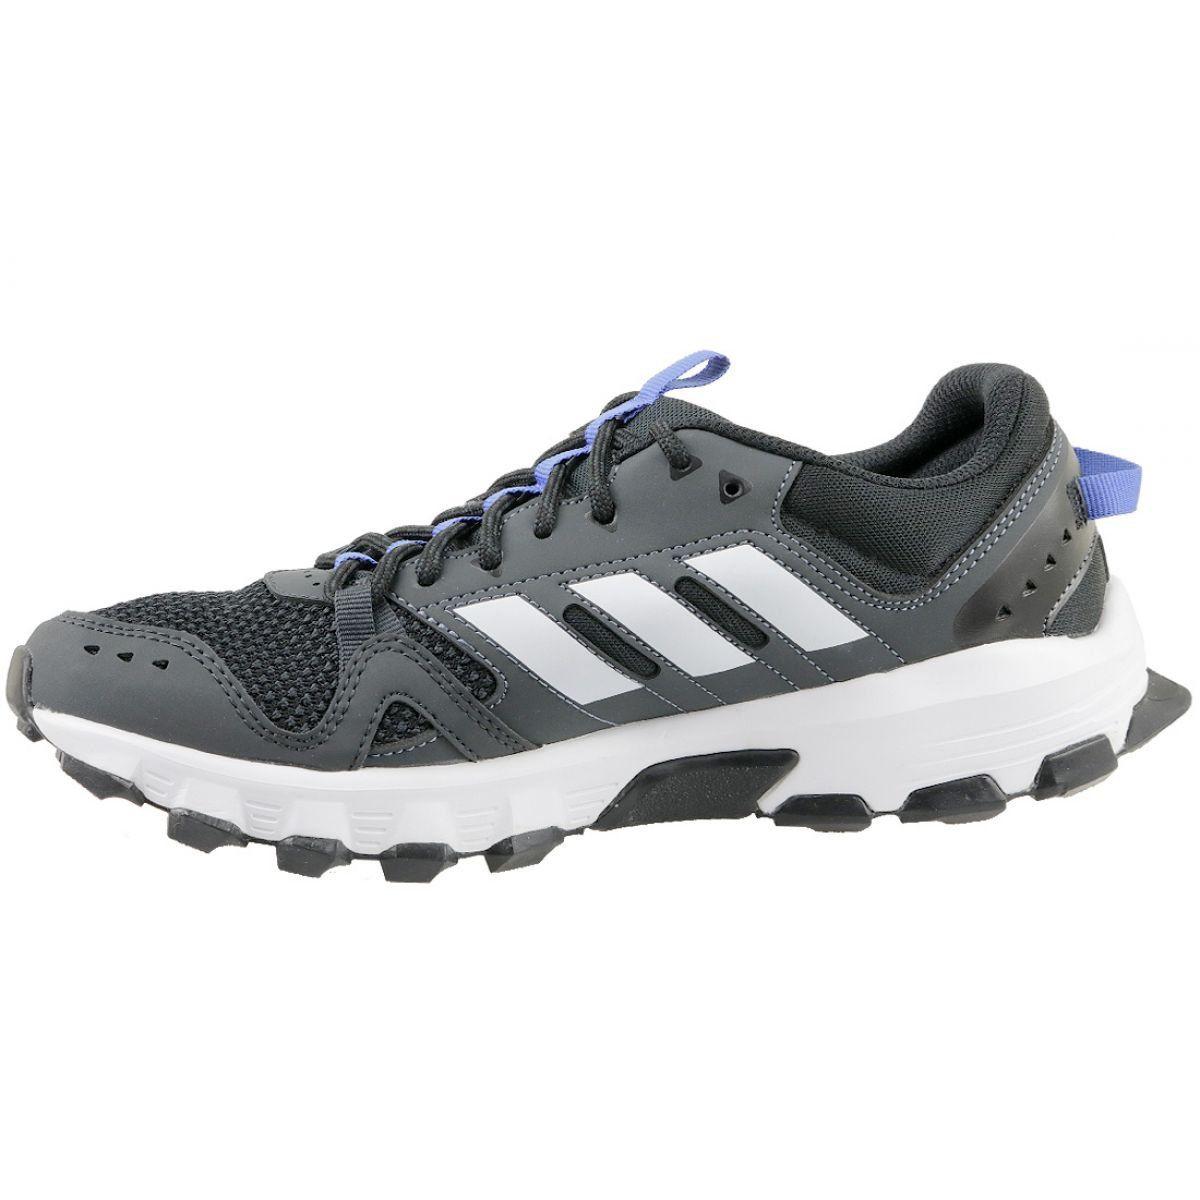 Buty Adidas Rockadia Trail M Cm7212 Szare Shoes Adidas Brand Adidas